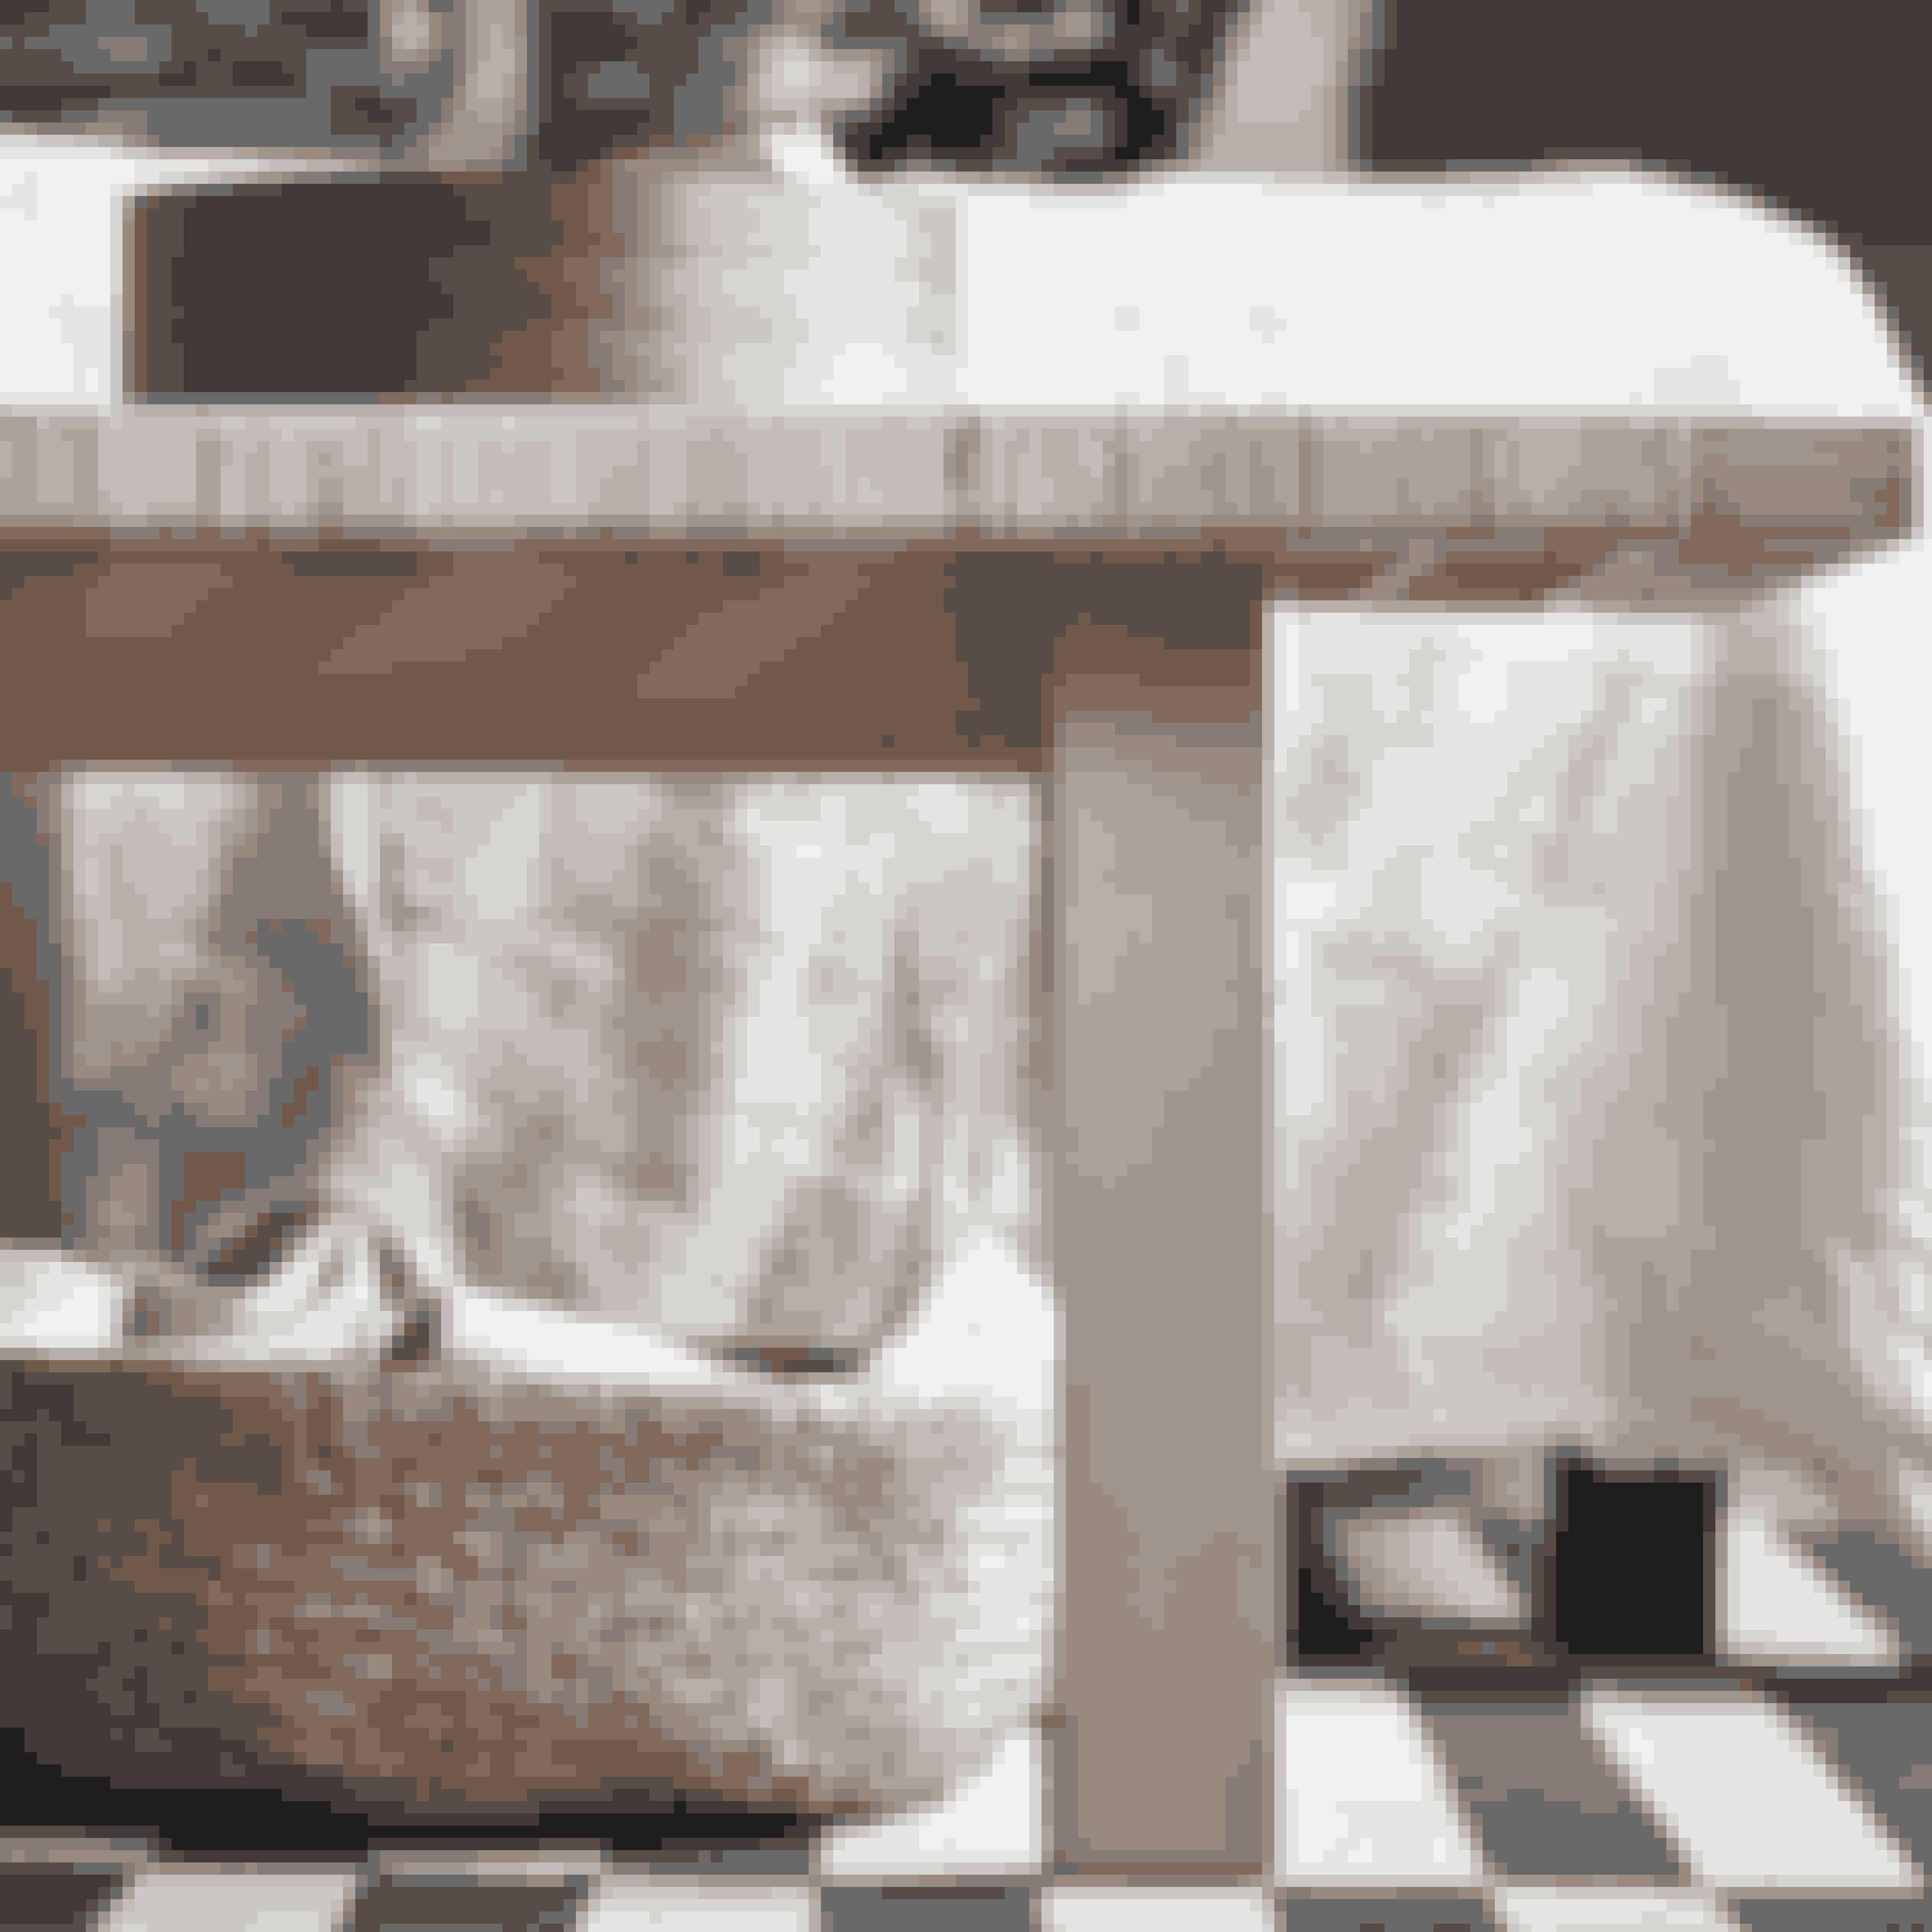 Sofabordet er lavet i materialet ratta, som bidrager med en nordisk og idyllisk indretning.Pris 1.199 kr.